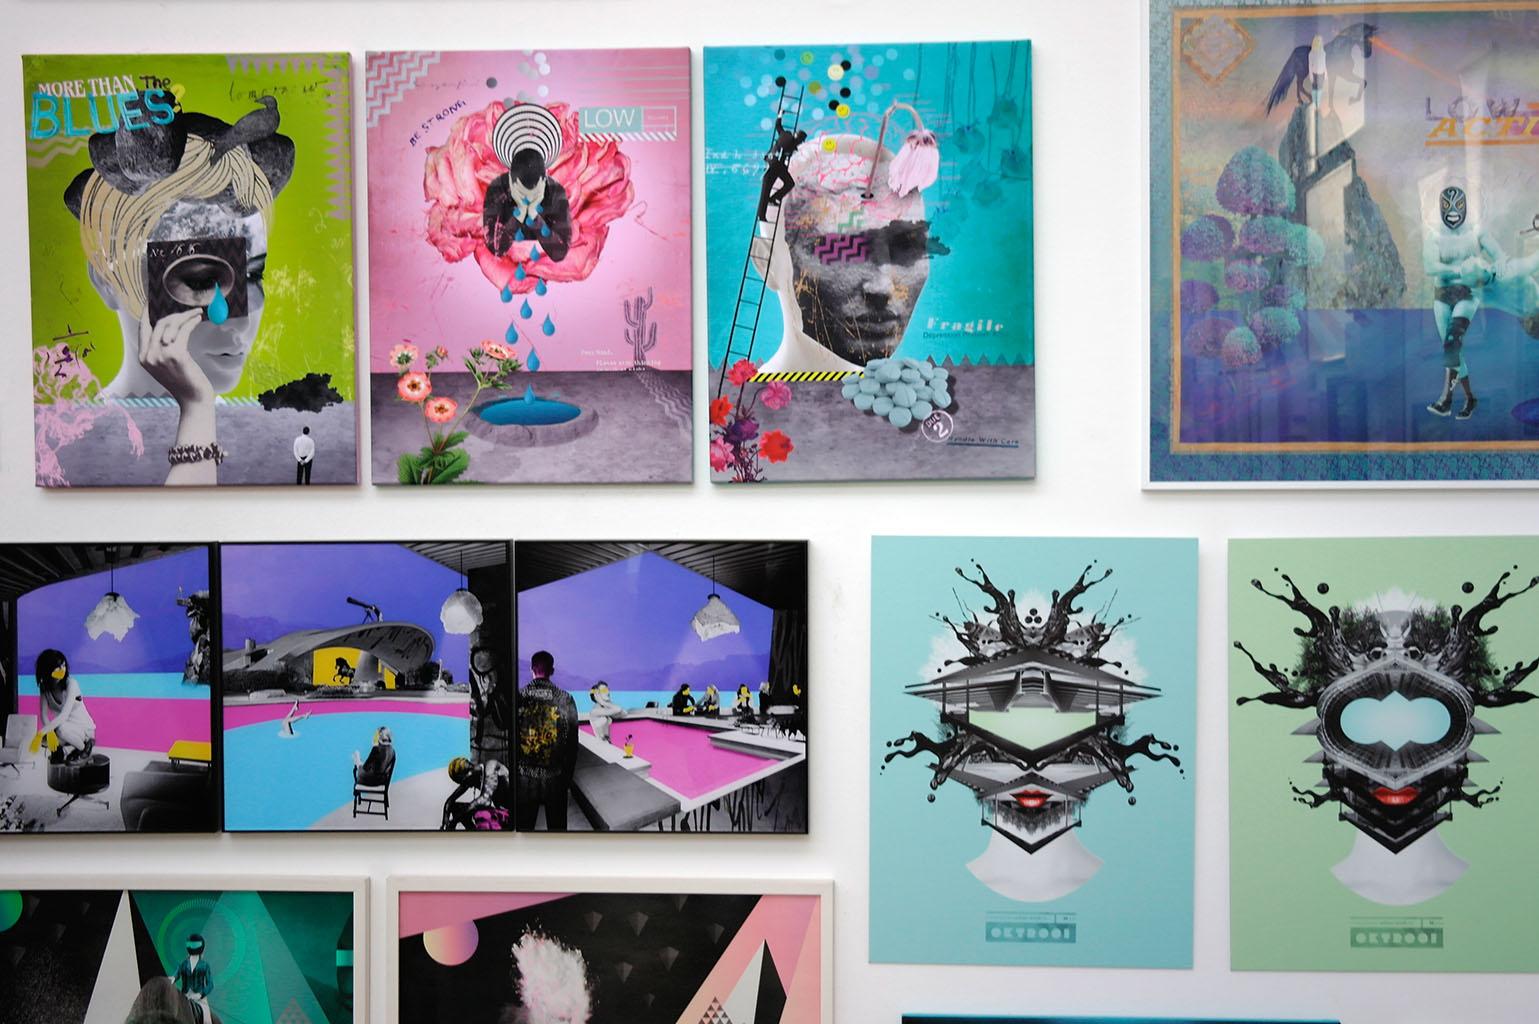 illu16-illustratoren-festival-köln-digital-hans-christian-sanladerer